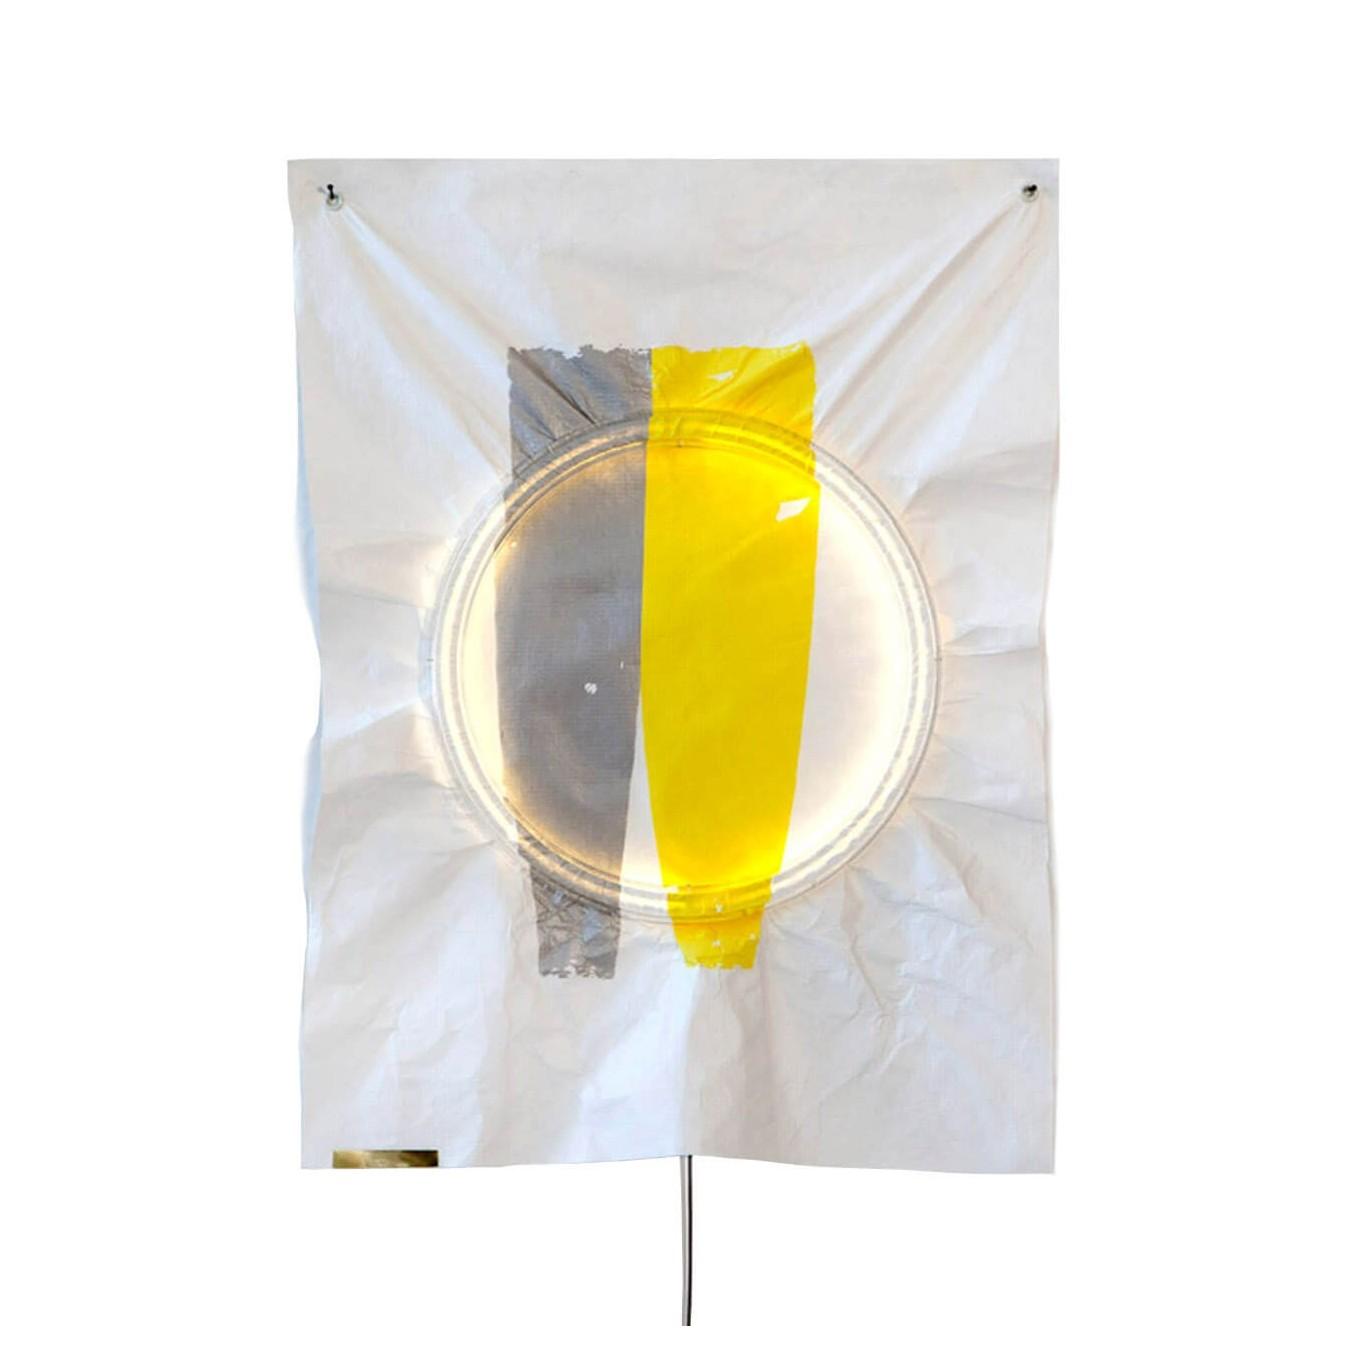 Light Object 009